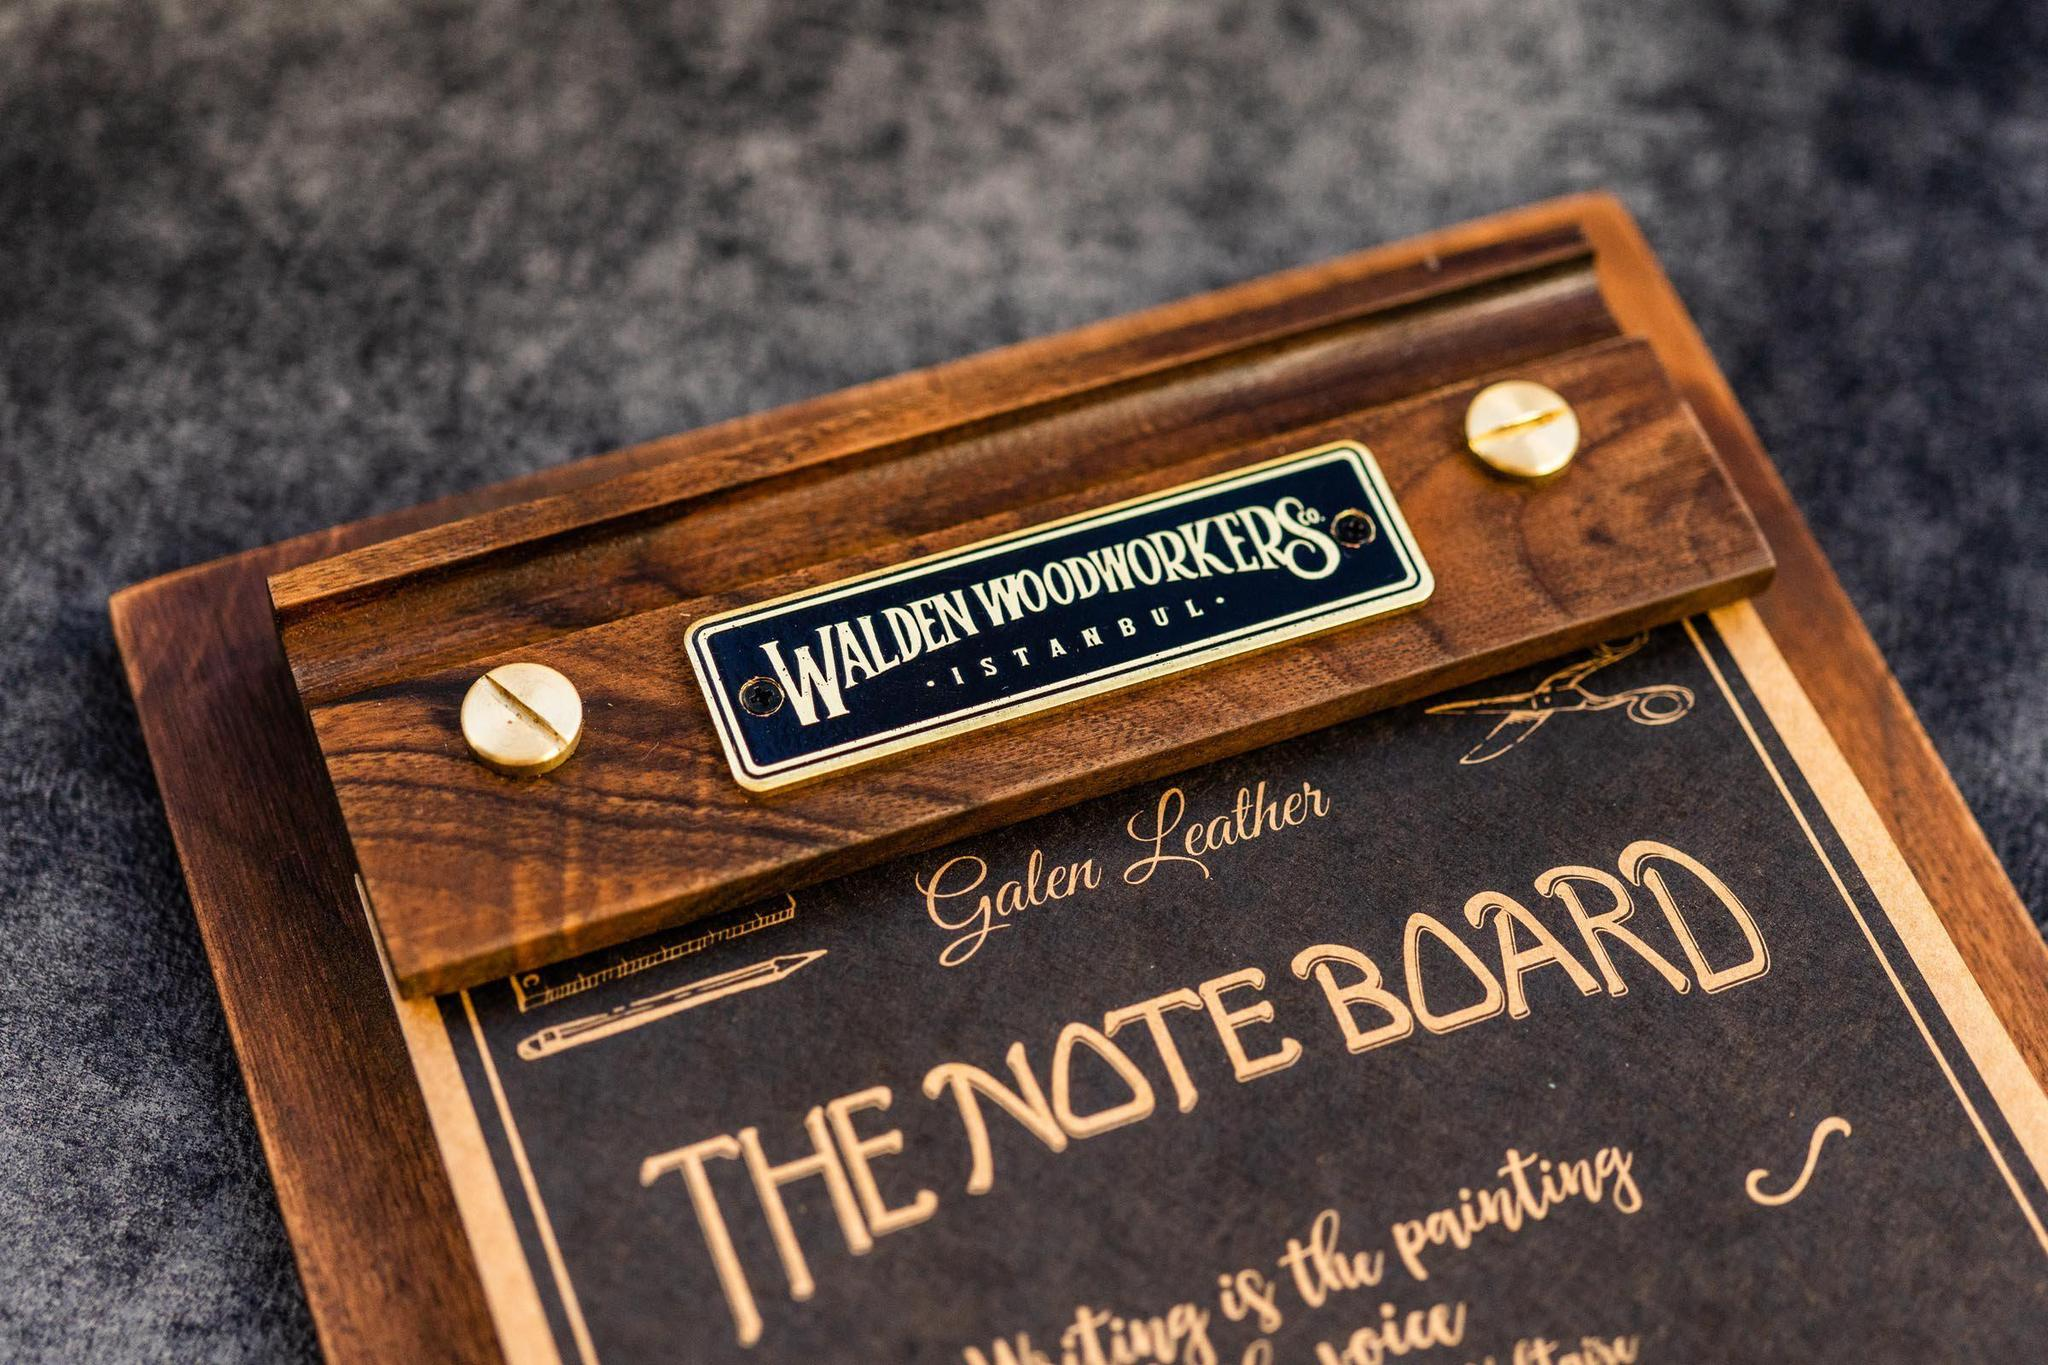 the note board